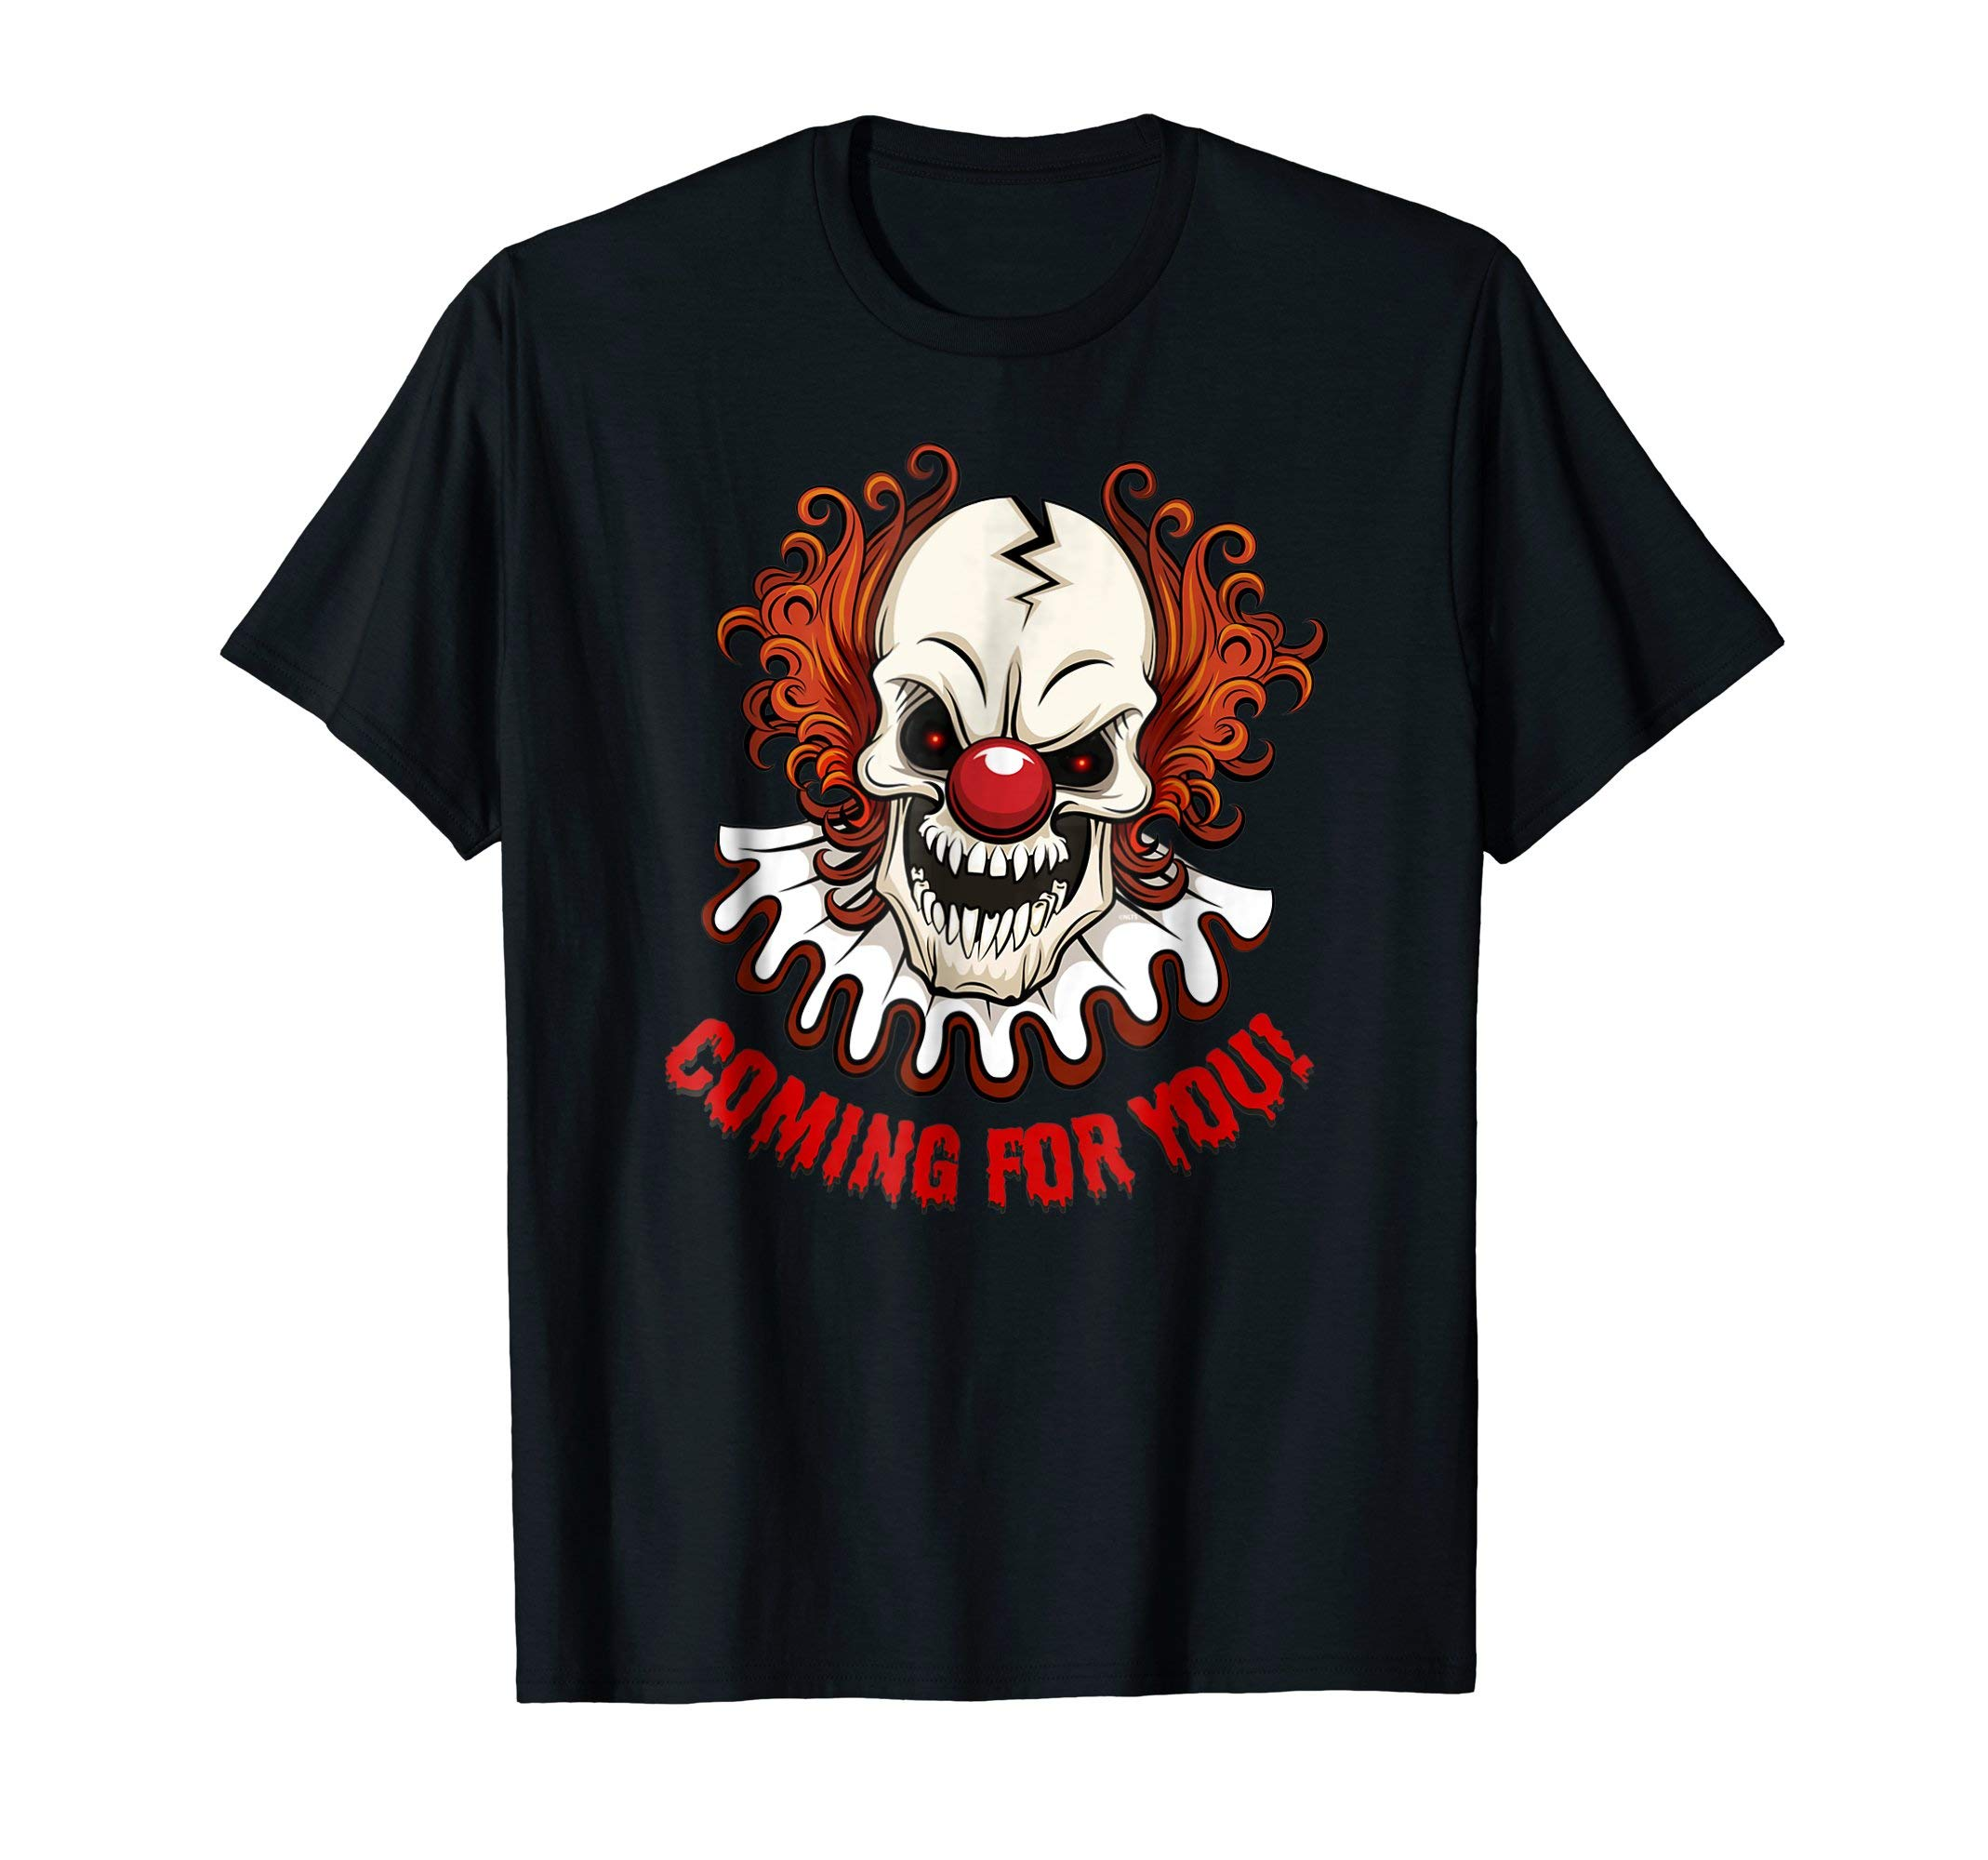 Scary-Clown-Creepy-Halloween-Shirt-Gifts-T-Shirt-Tee